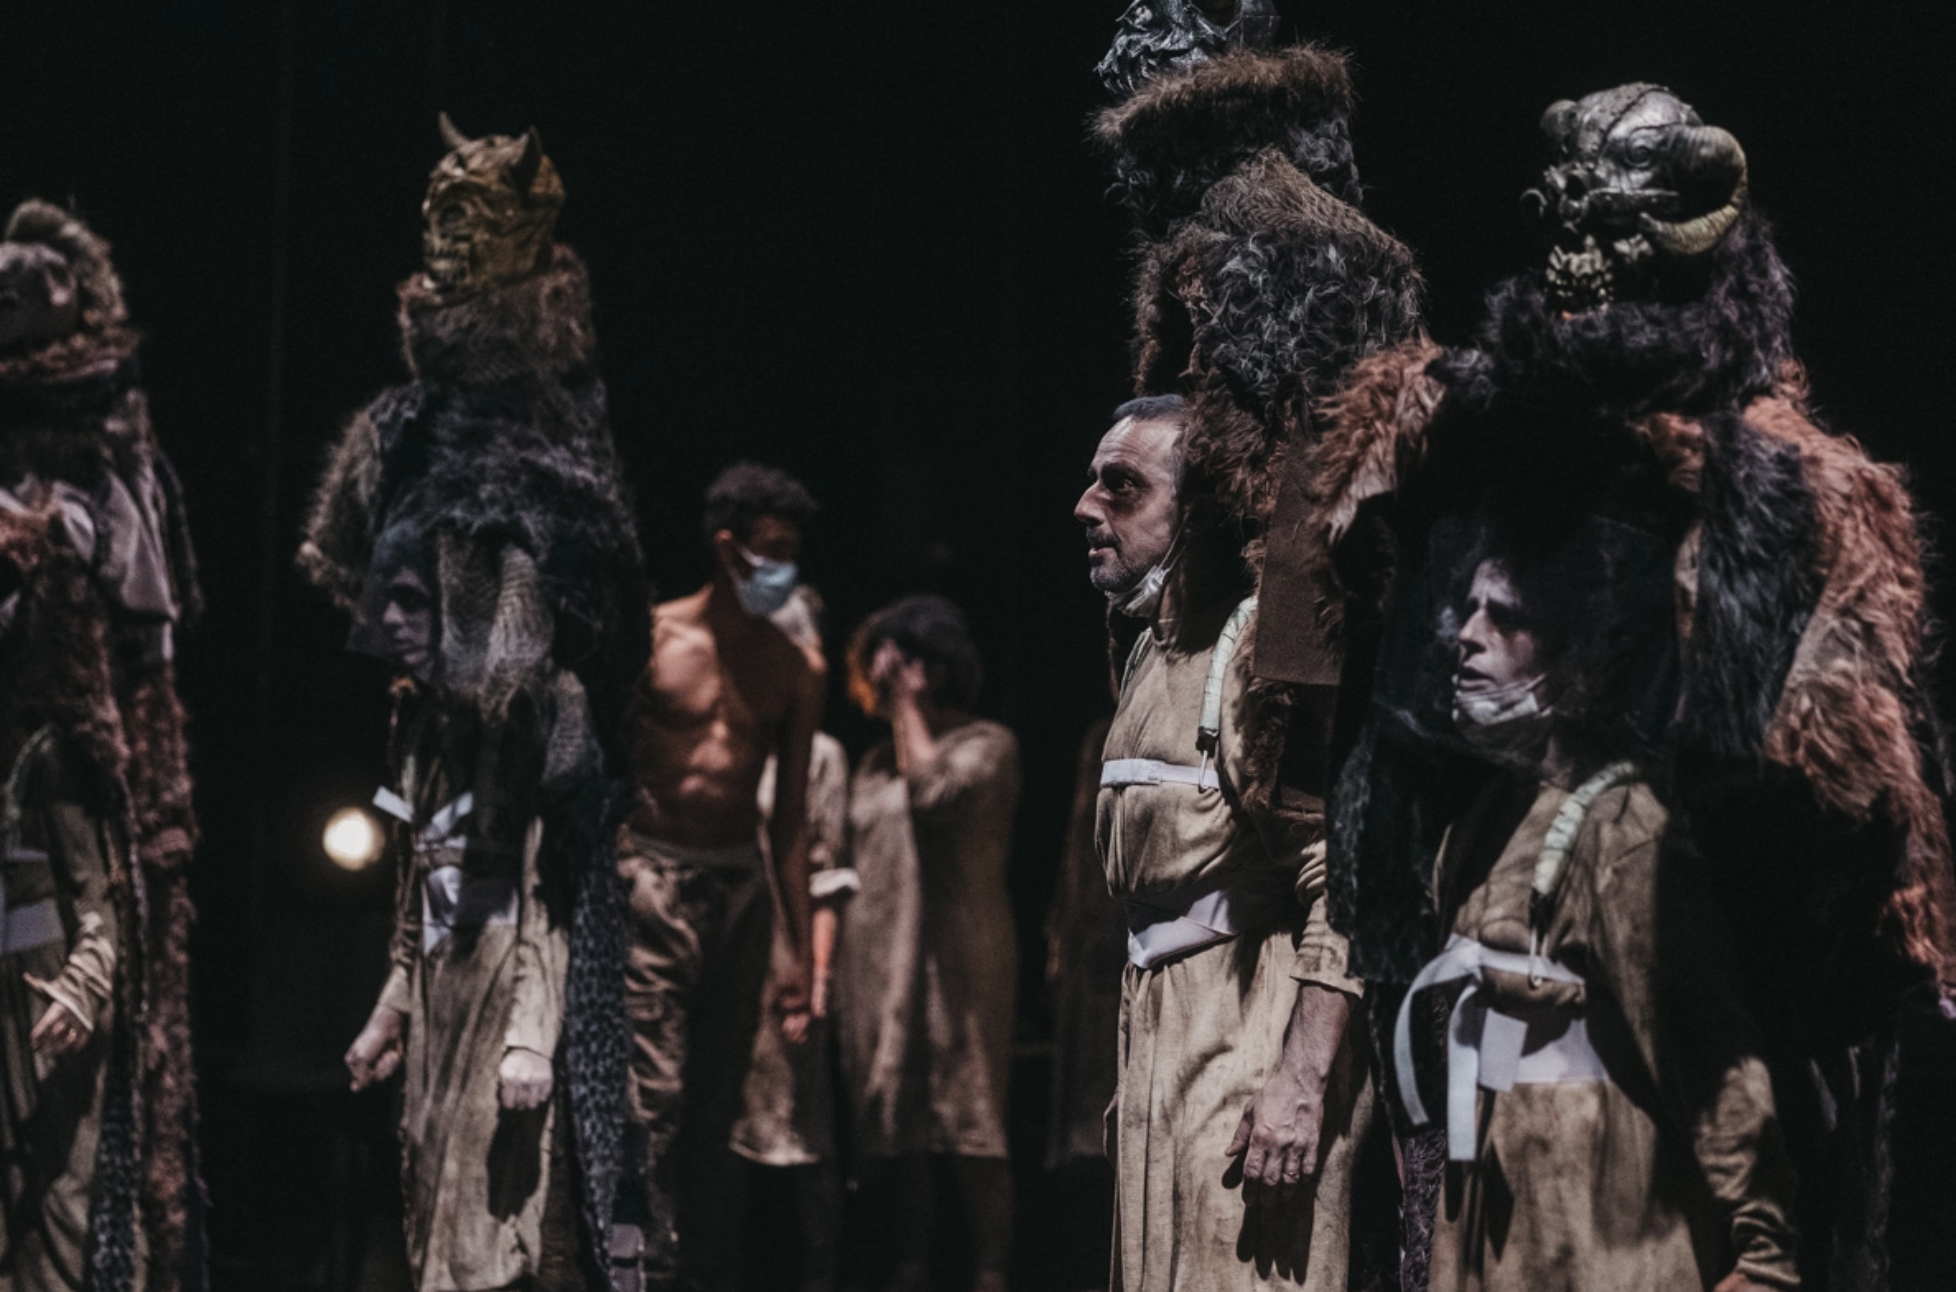 Crítica: Réquiem de Mozart. Noche de Walpurgis a la donostiarra